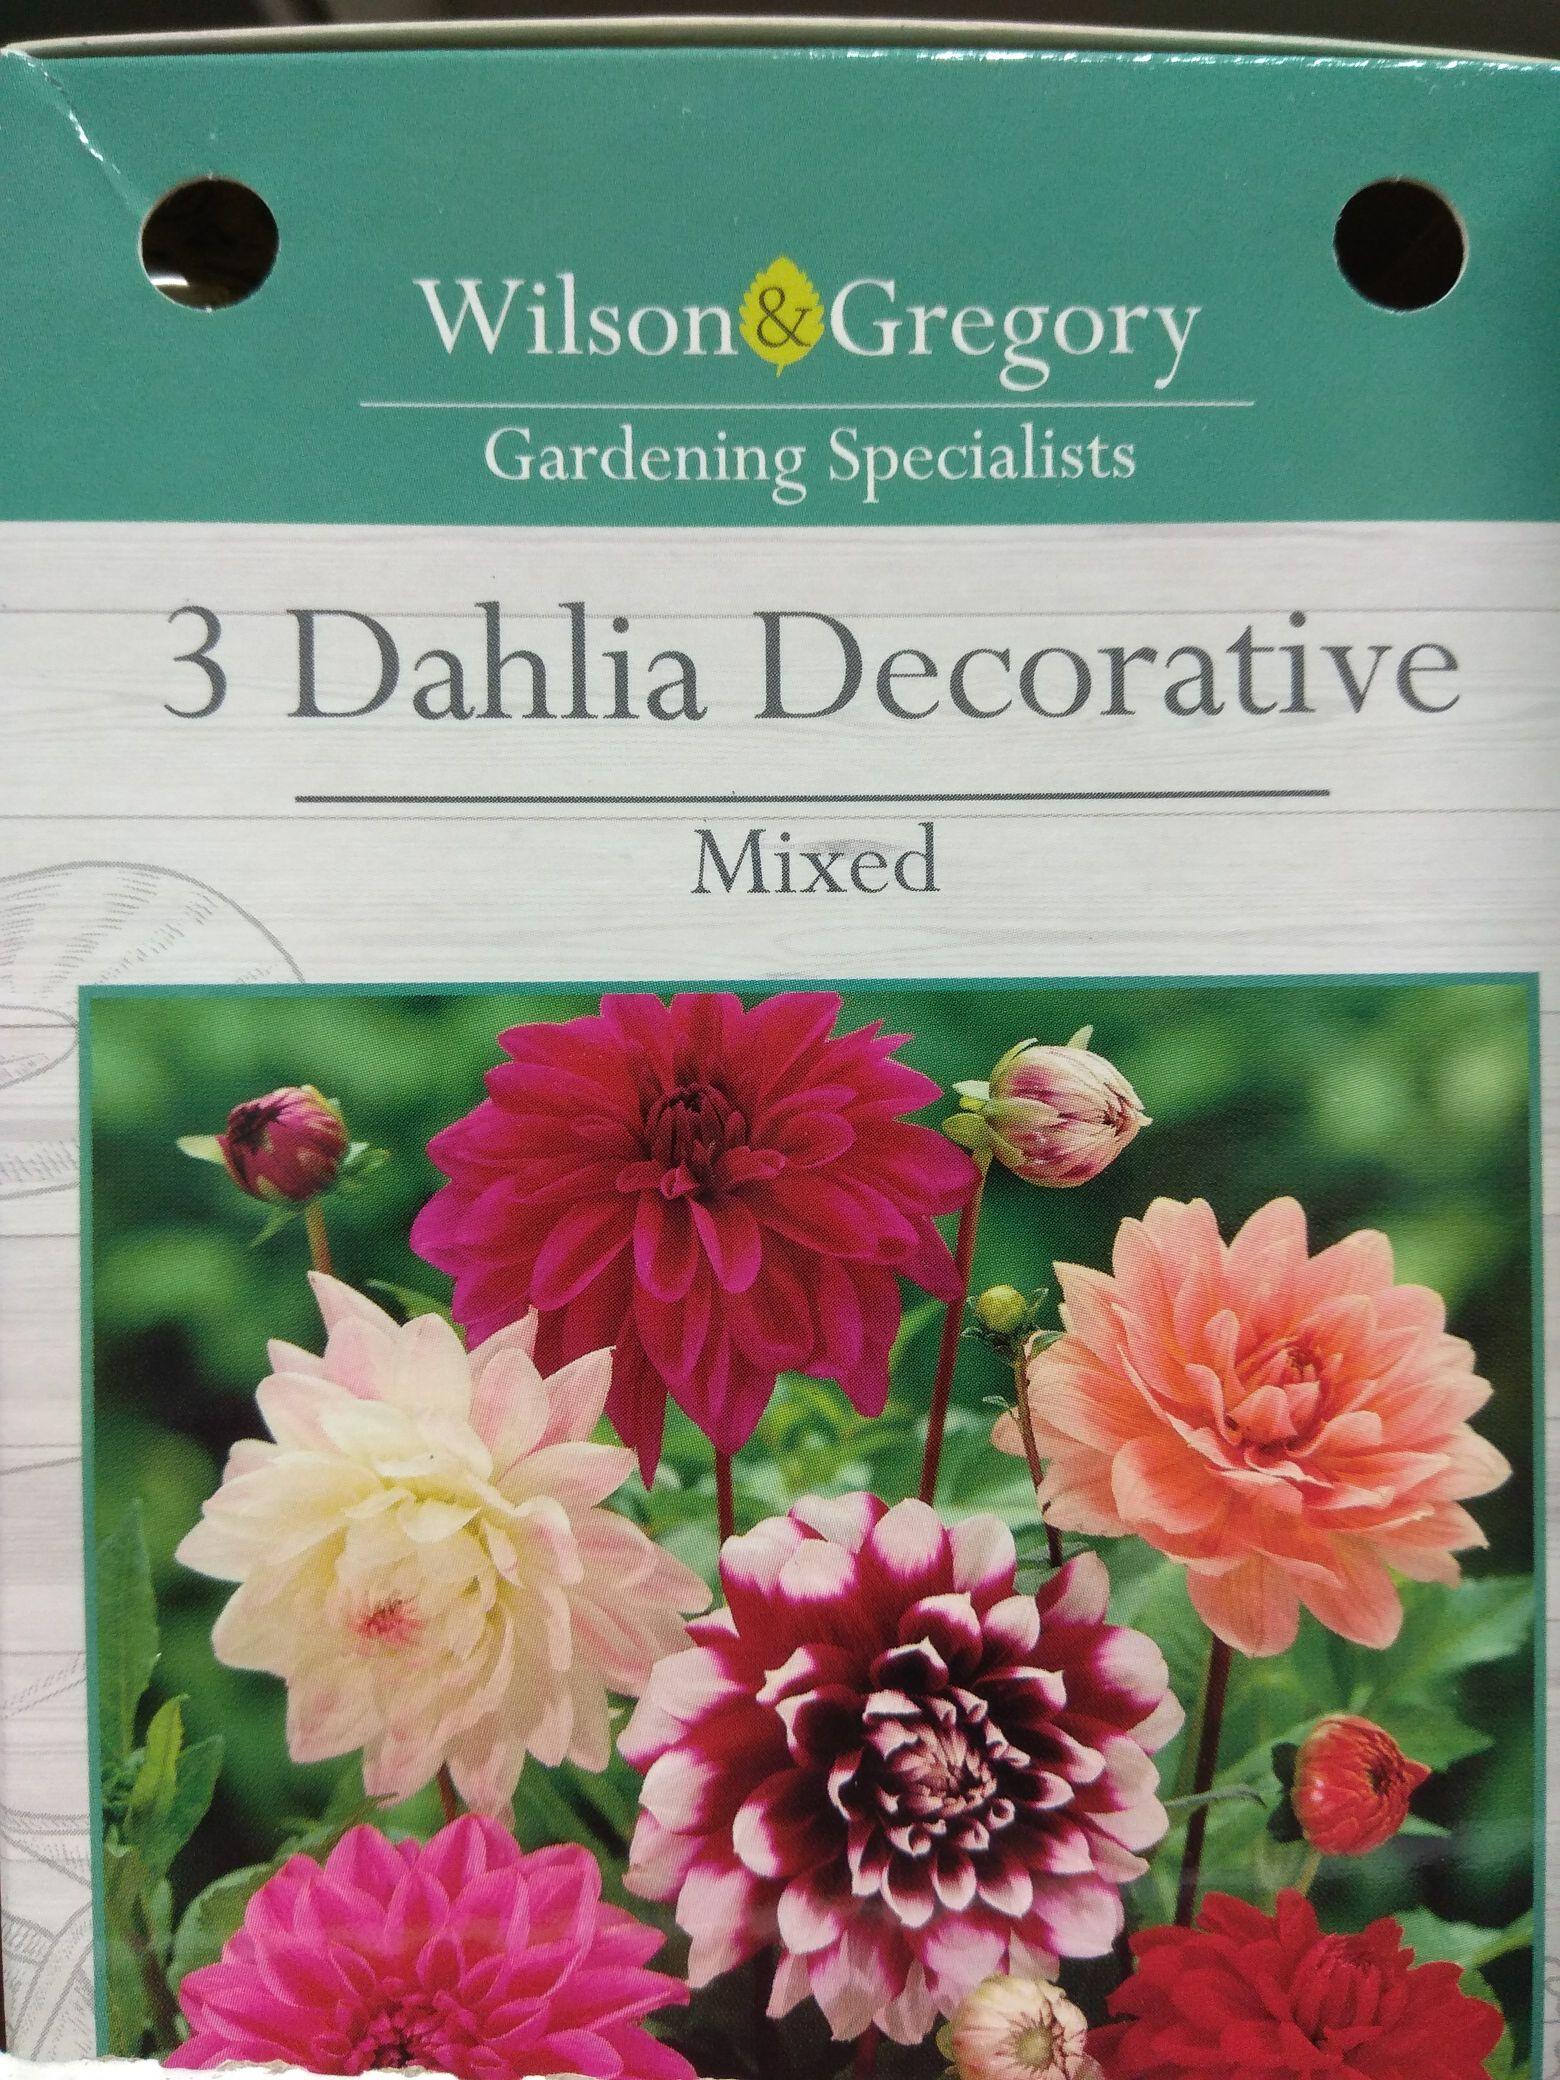 3 x Dahlia decorative mixed bulbs £1 @ Poundland